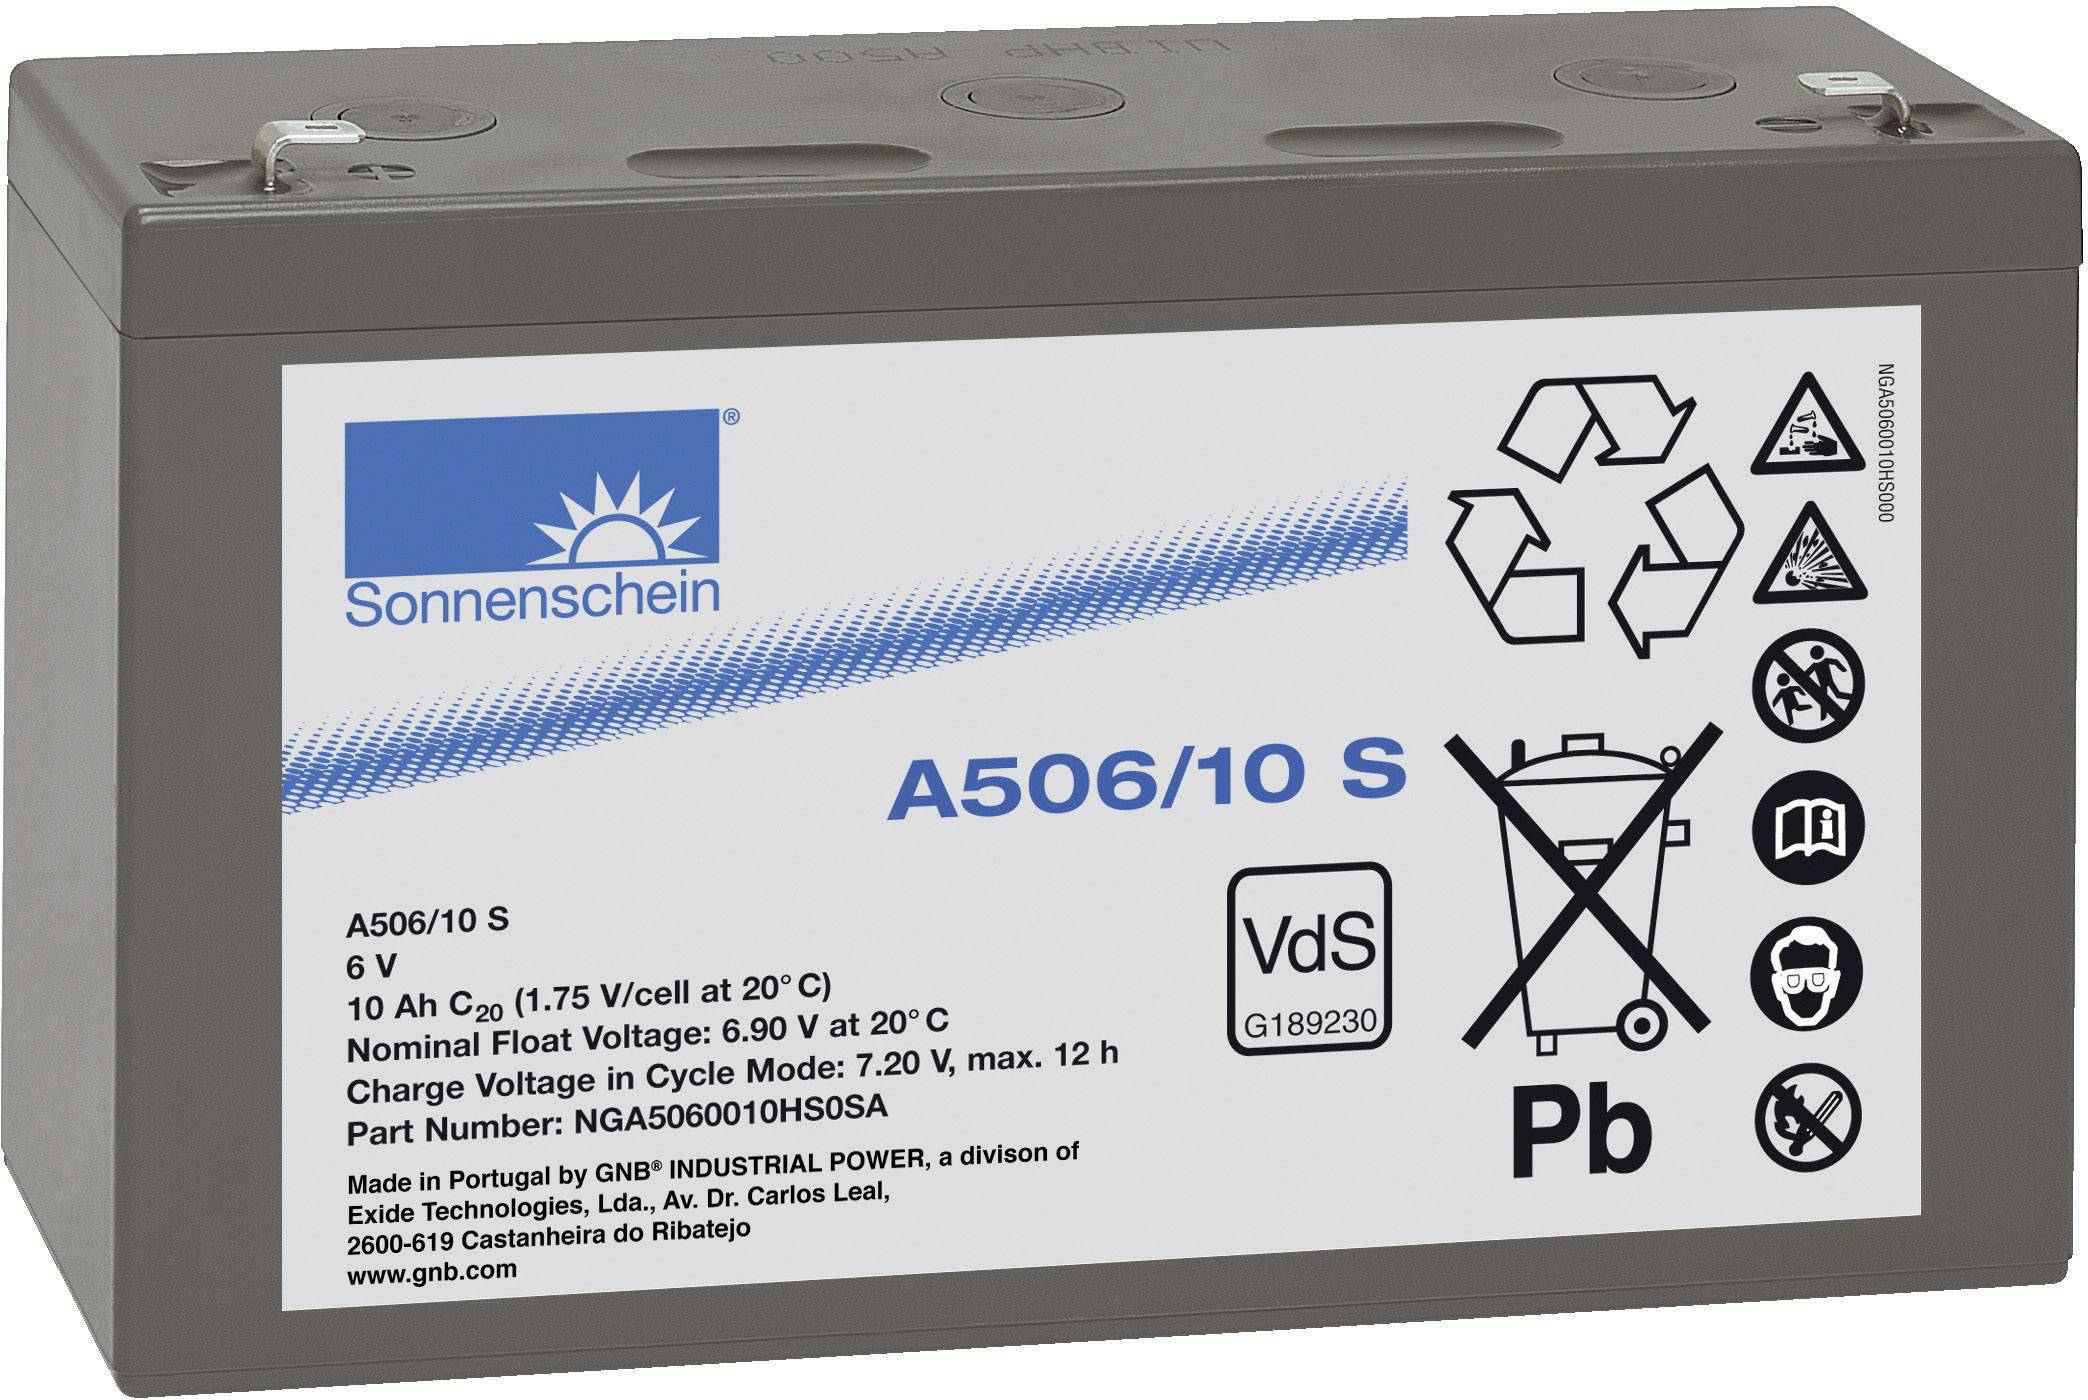 Olovený akumulátor GNB Sonnenschein A506/10 S NGA5060010HS0SA, 10 Ah, 6 V